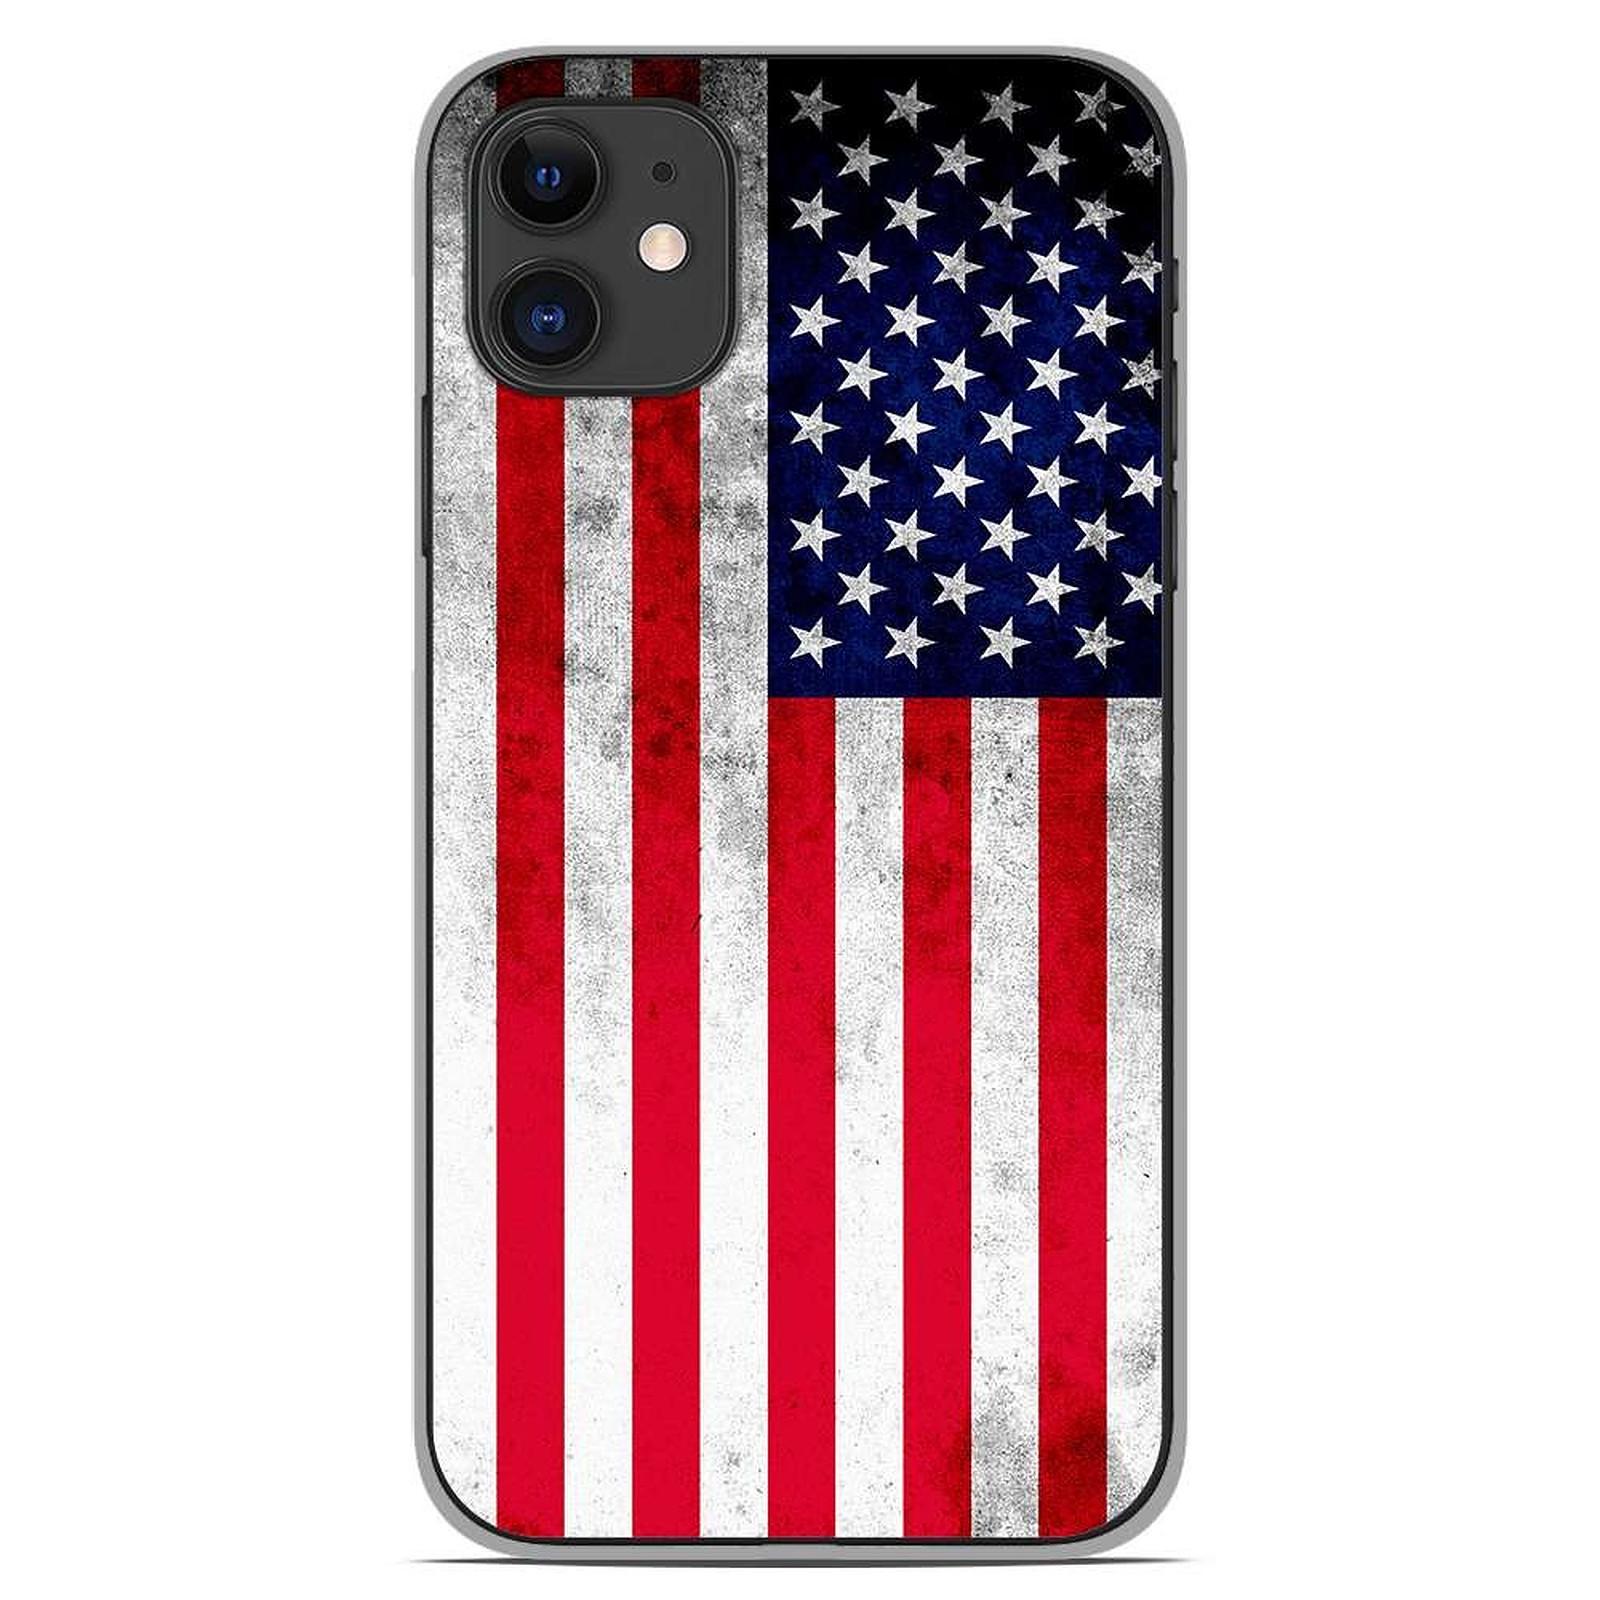 1001 Coques Coque silicone gel Apple iPhone 11 motif Drapeau USA